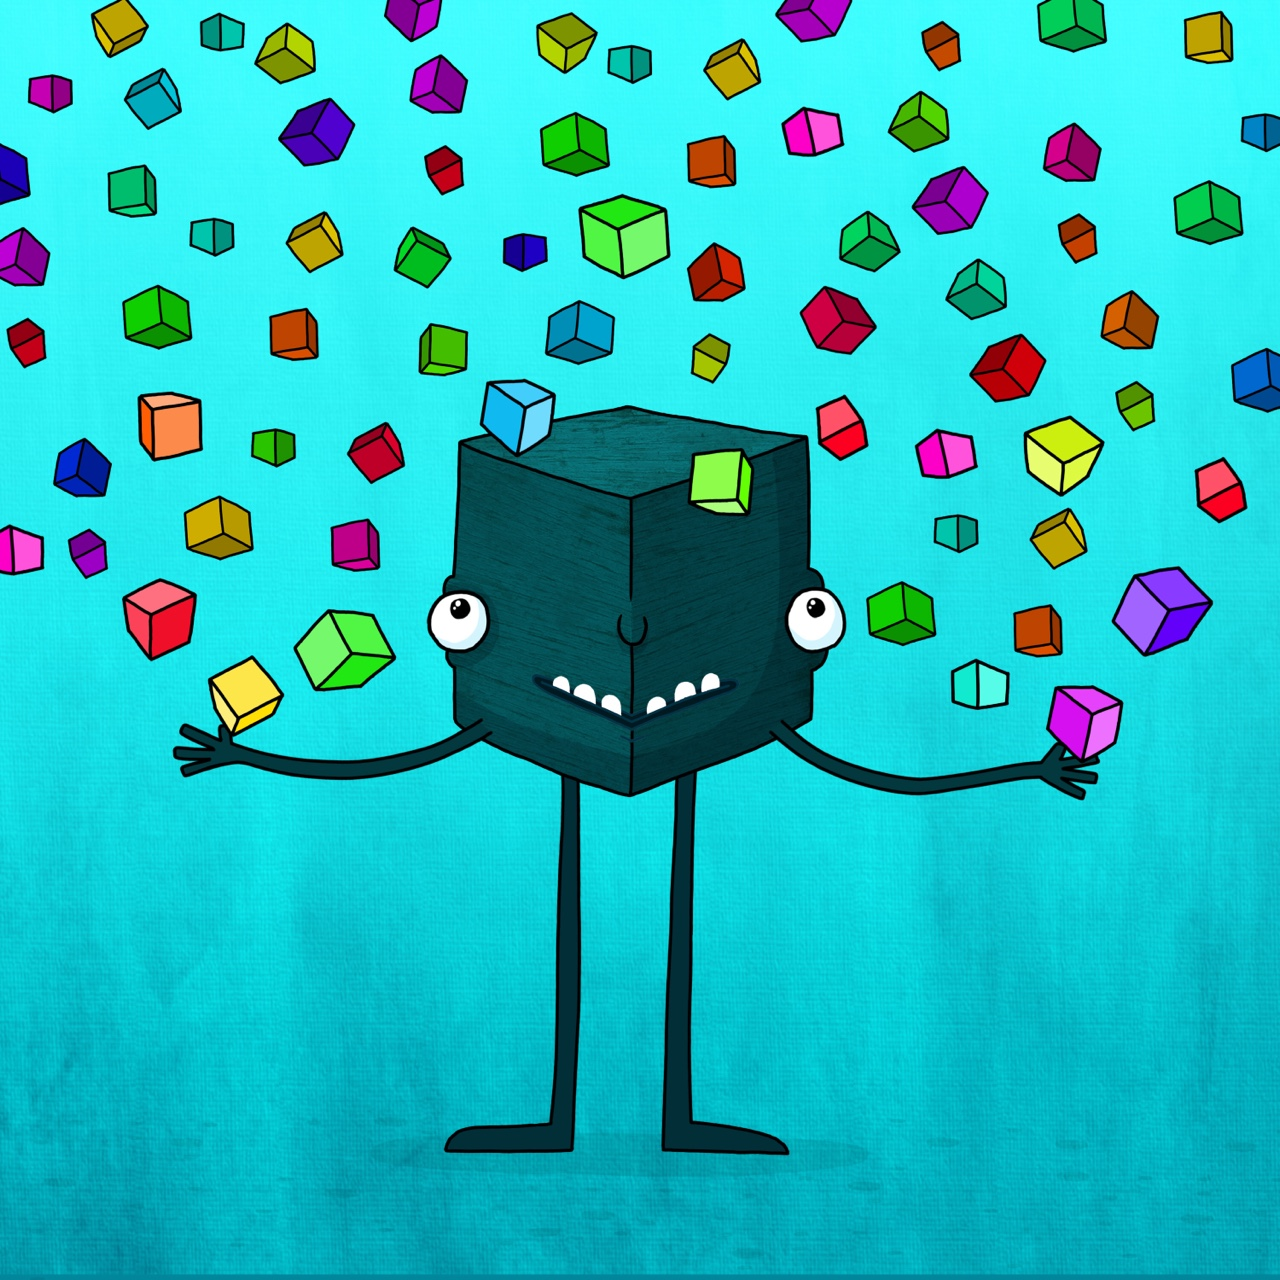 Cube levitating cubes.